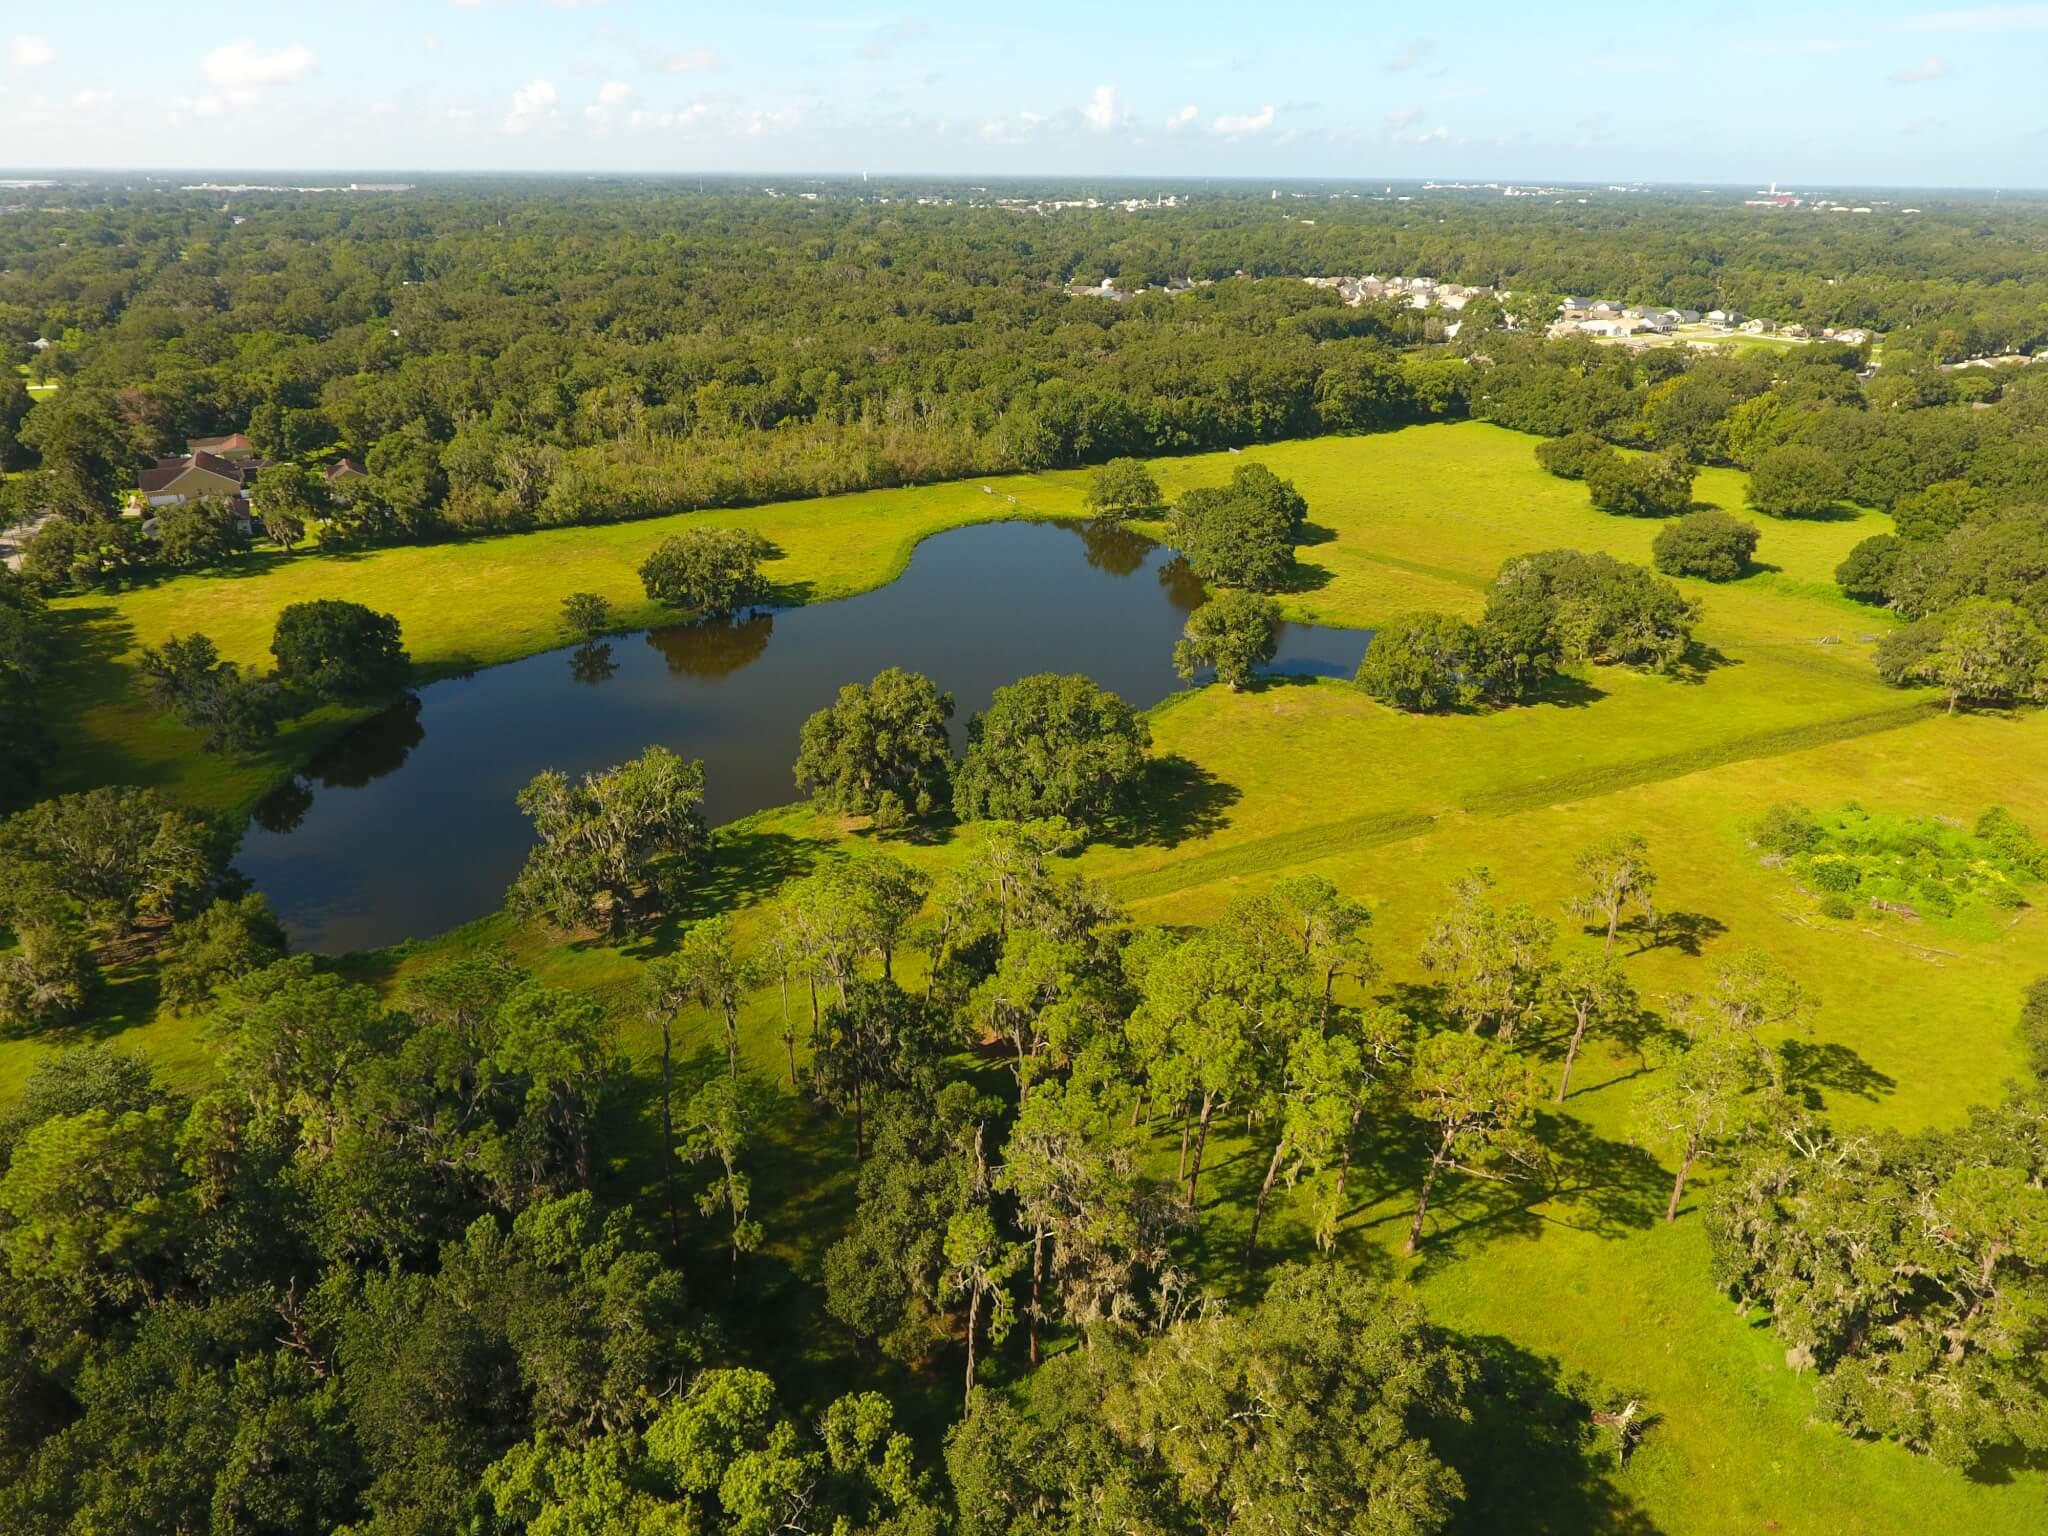 Wish Farms' New Headquarters Property